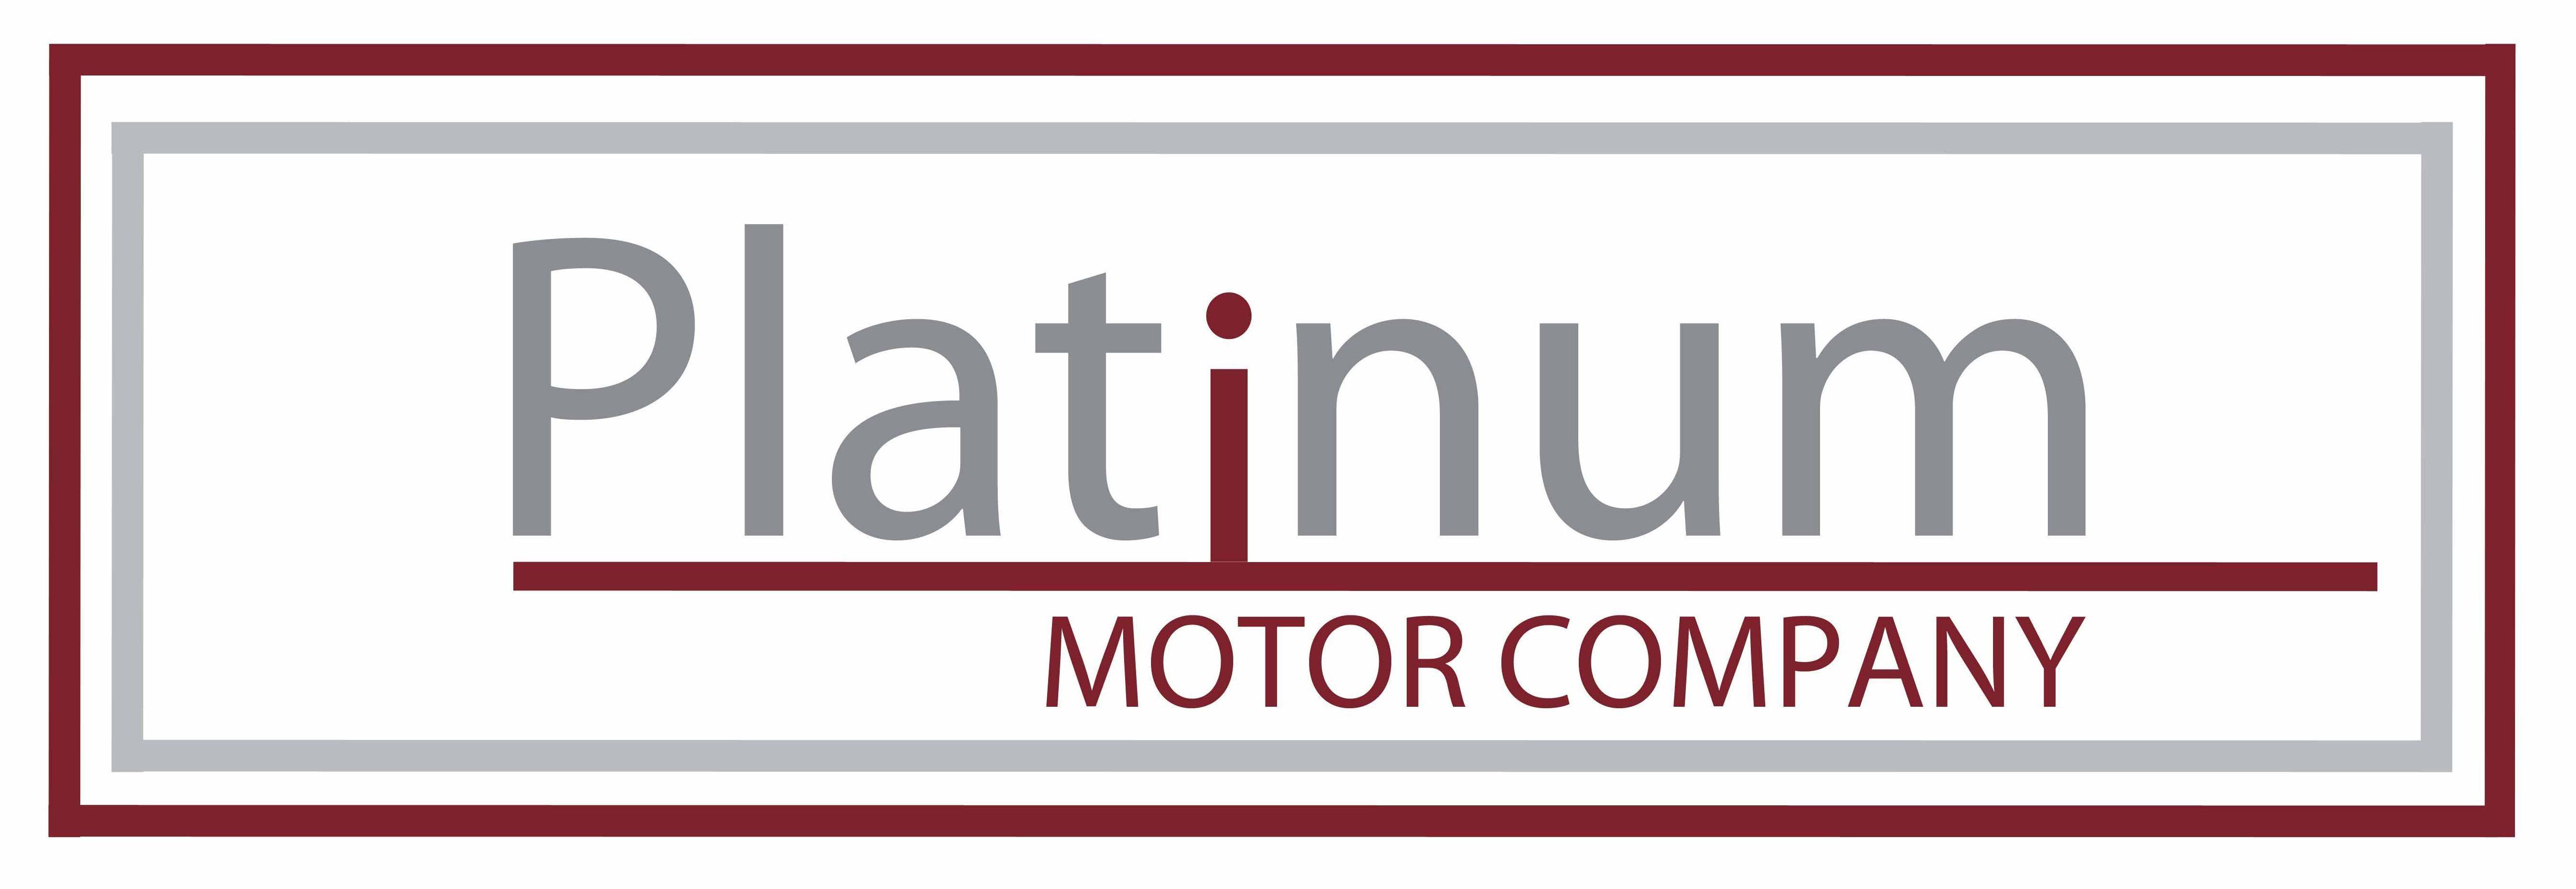 PLATINUM MOTOR COMPANY